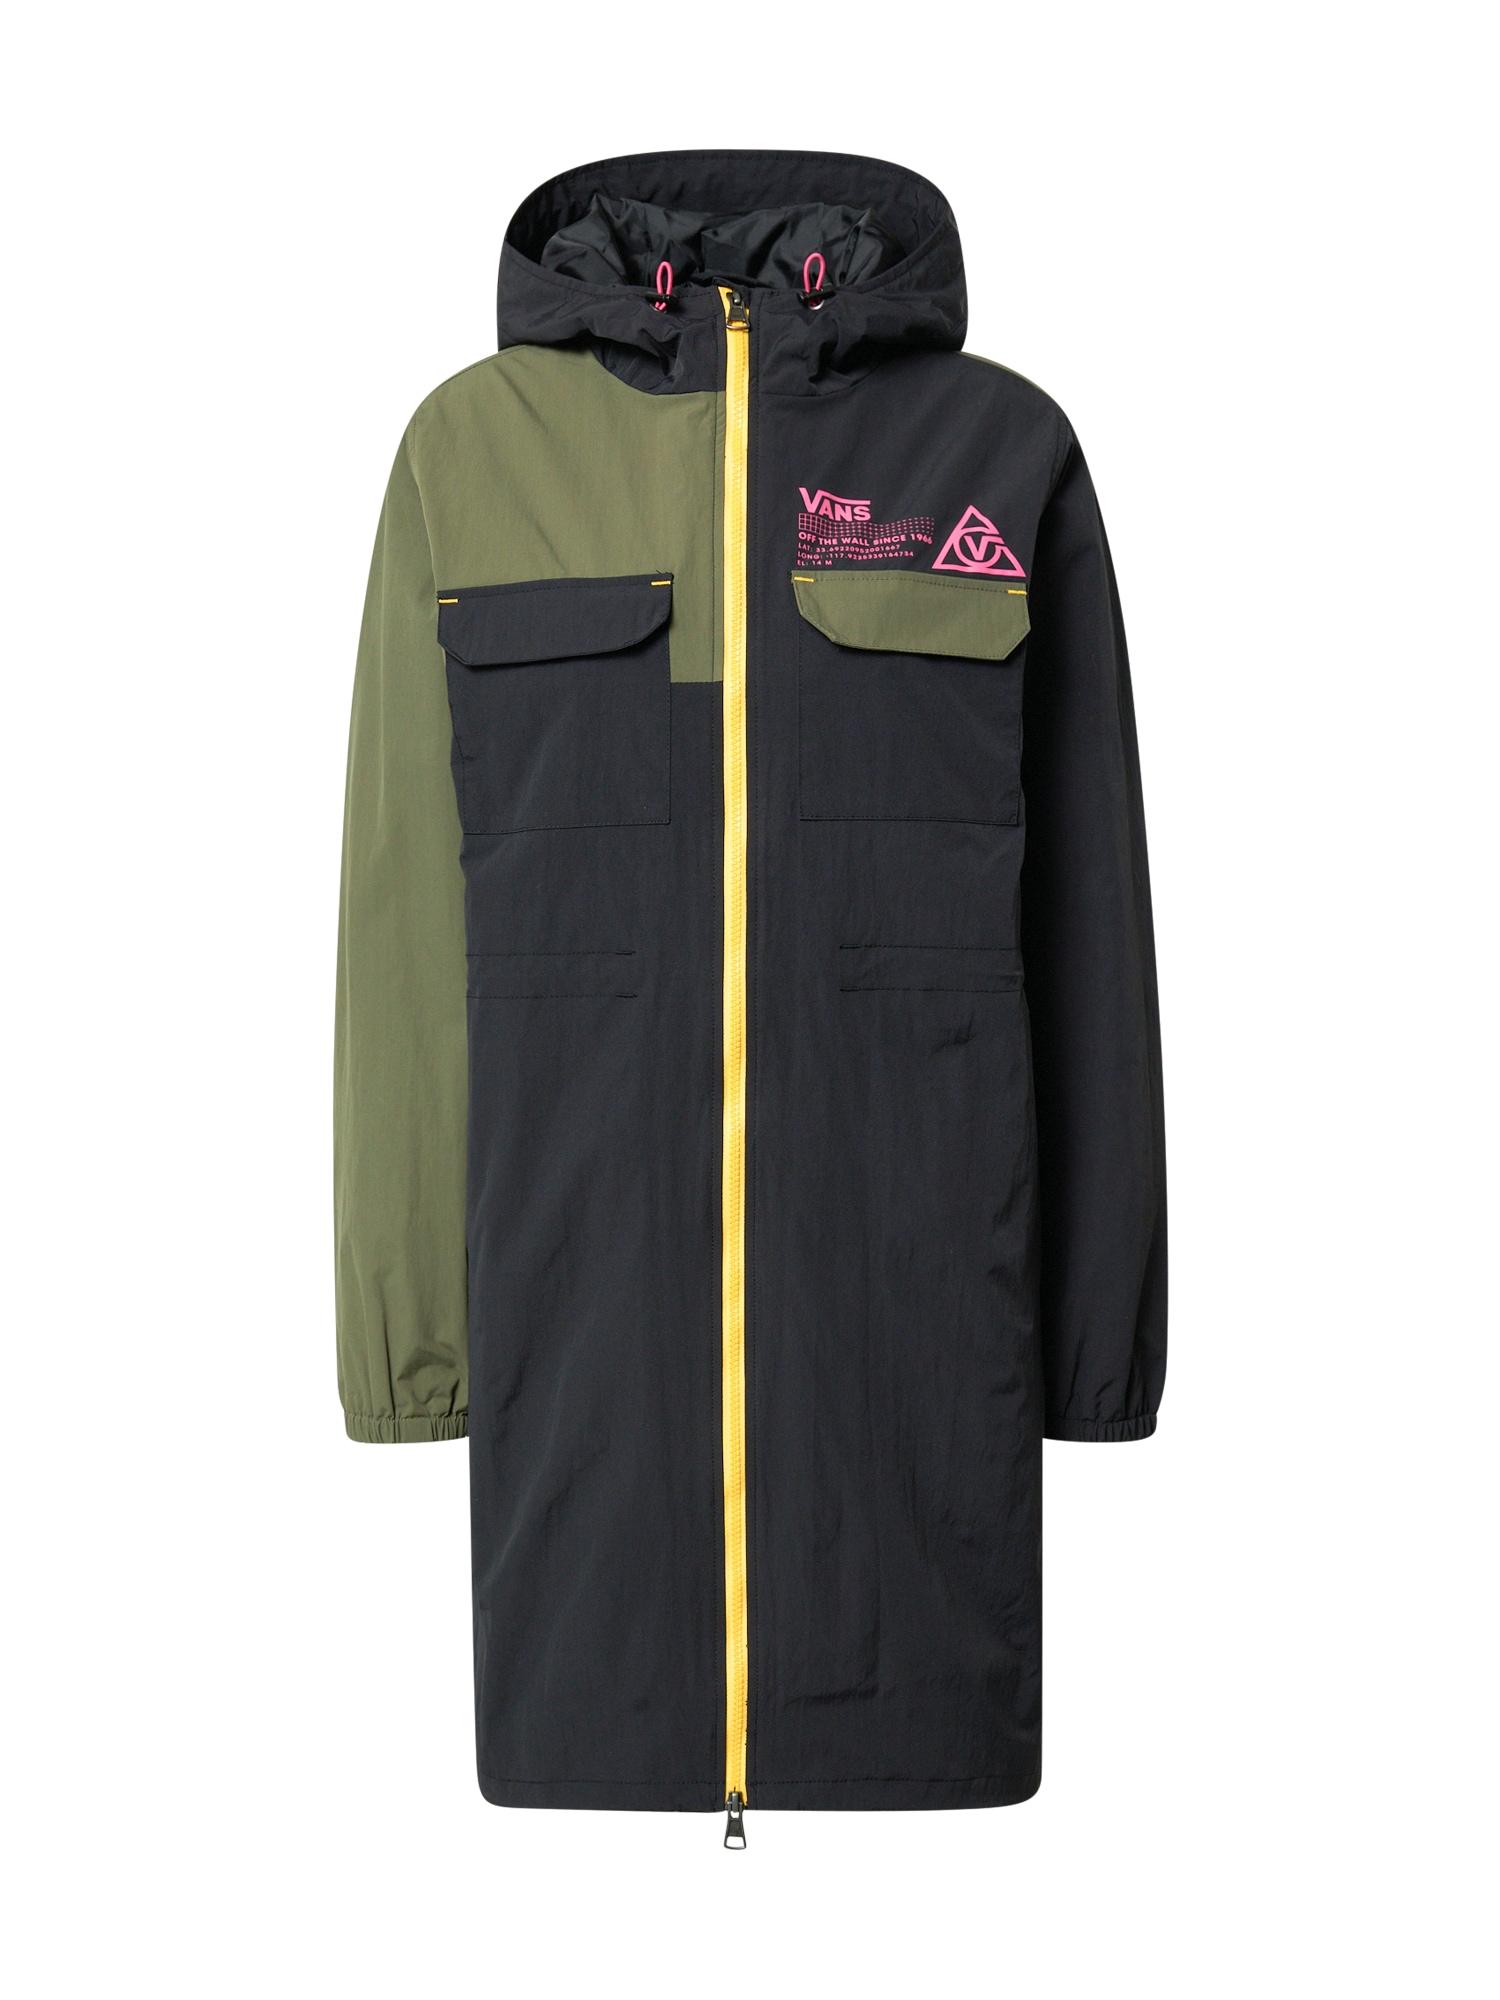 VANS Demisezoninis paltas juoda / rusvai žalia / geltona